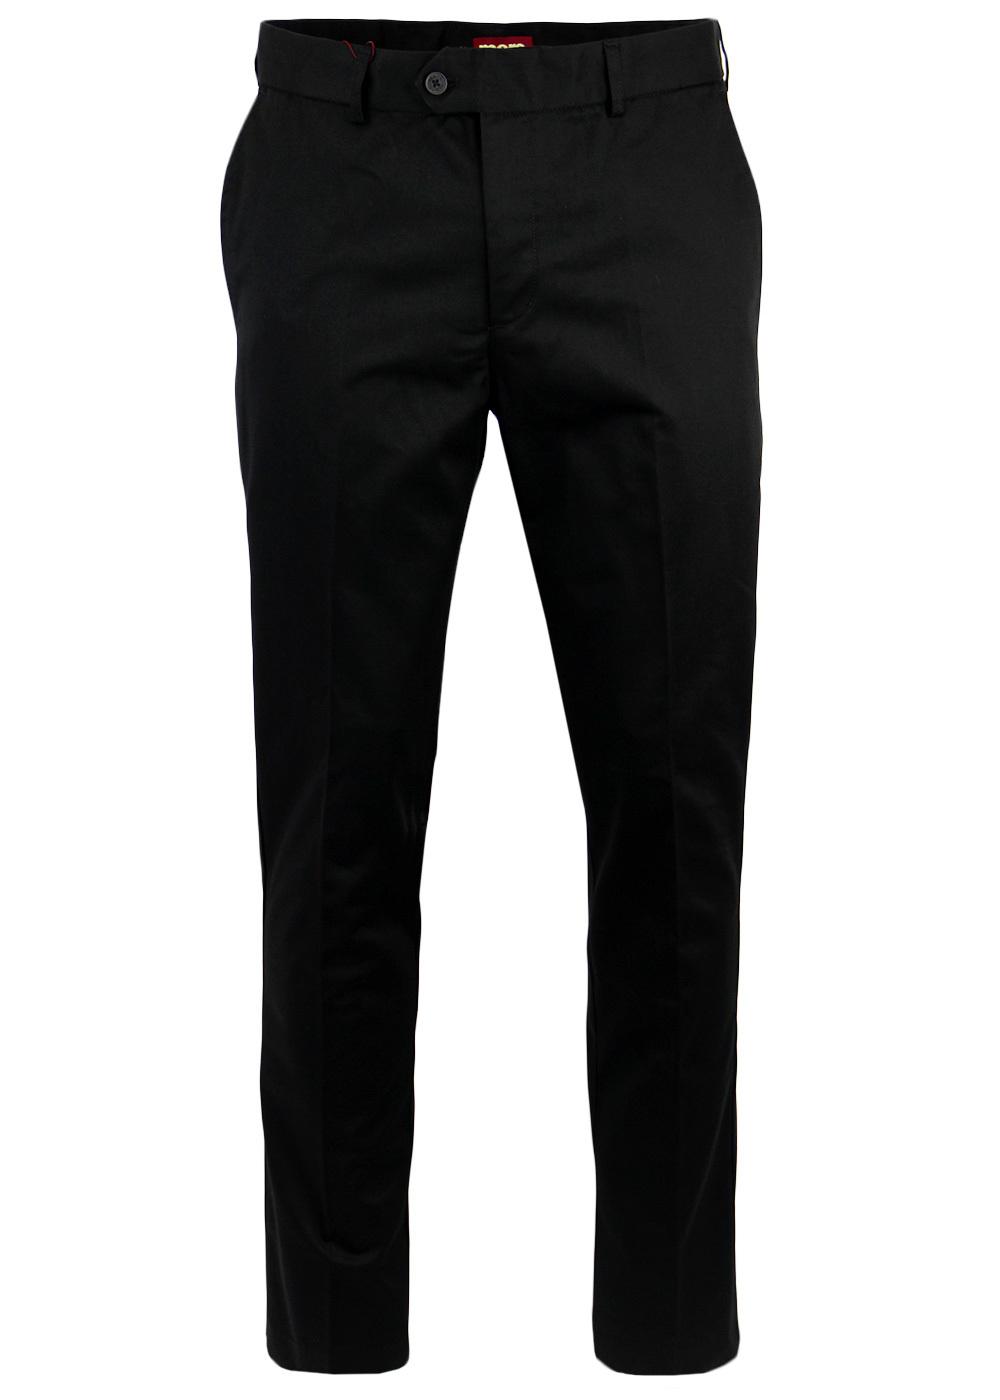 'Winston' MERC Mod Sta Press Retro Mens Trousers B